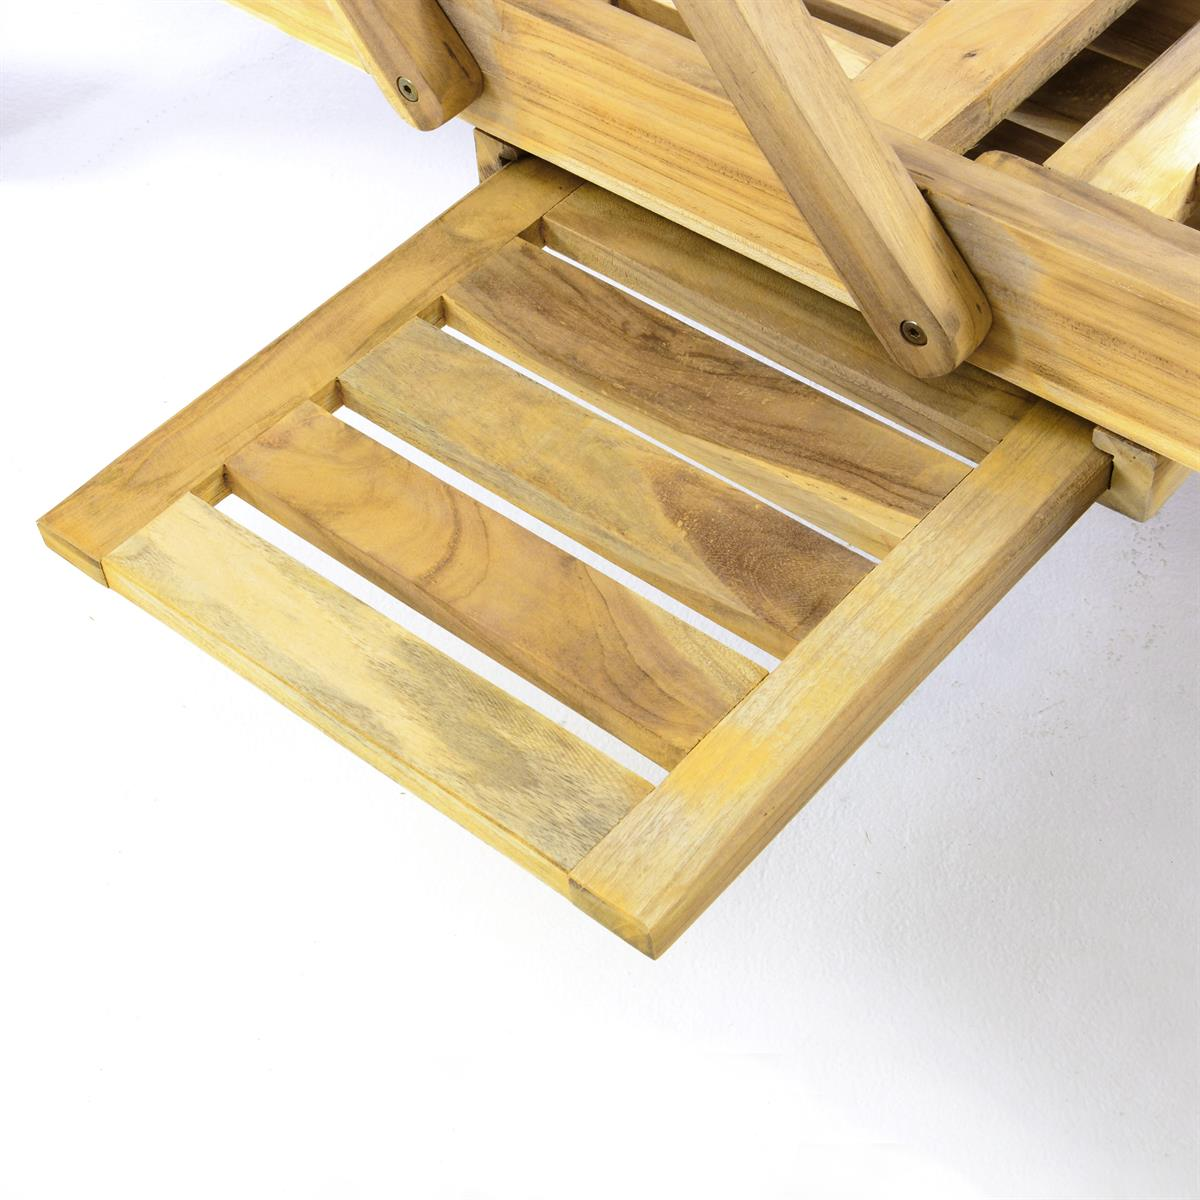 Genial Divero Sonnenliege Garten Relax Liege Teak Holz Inkl Räder